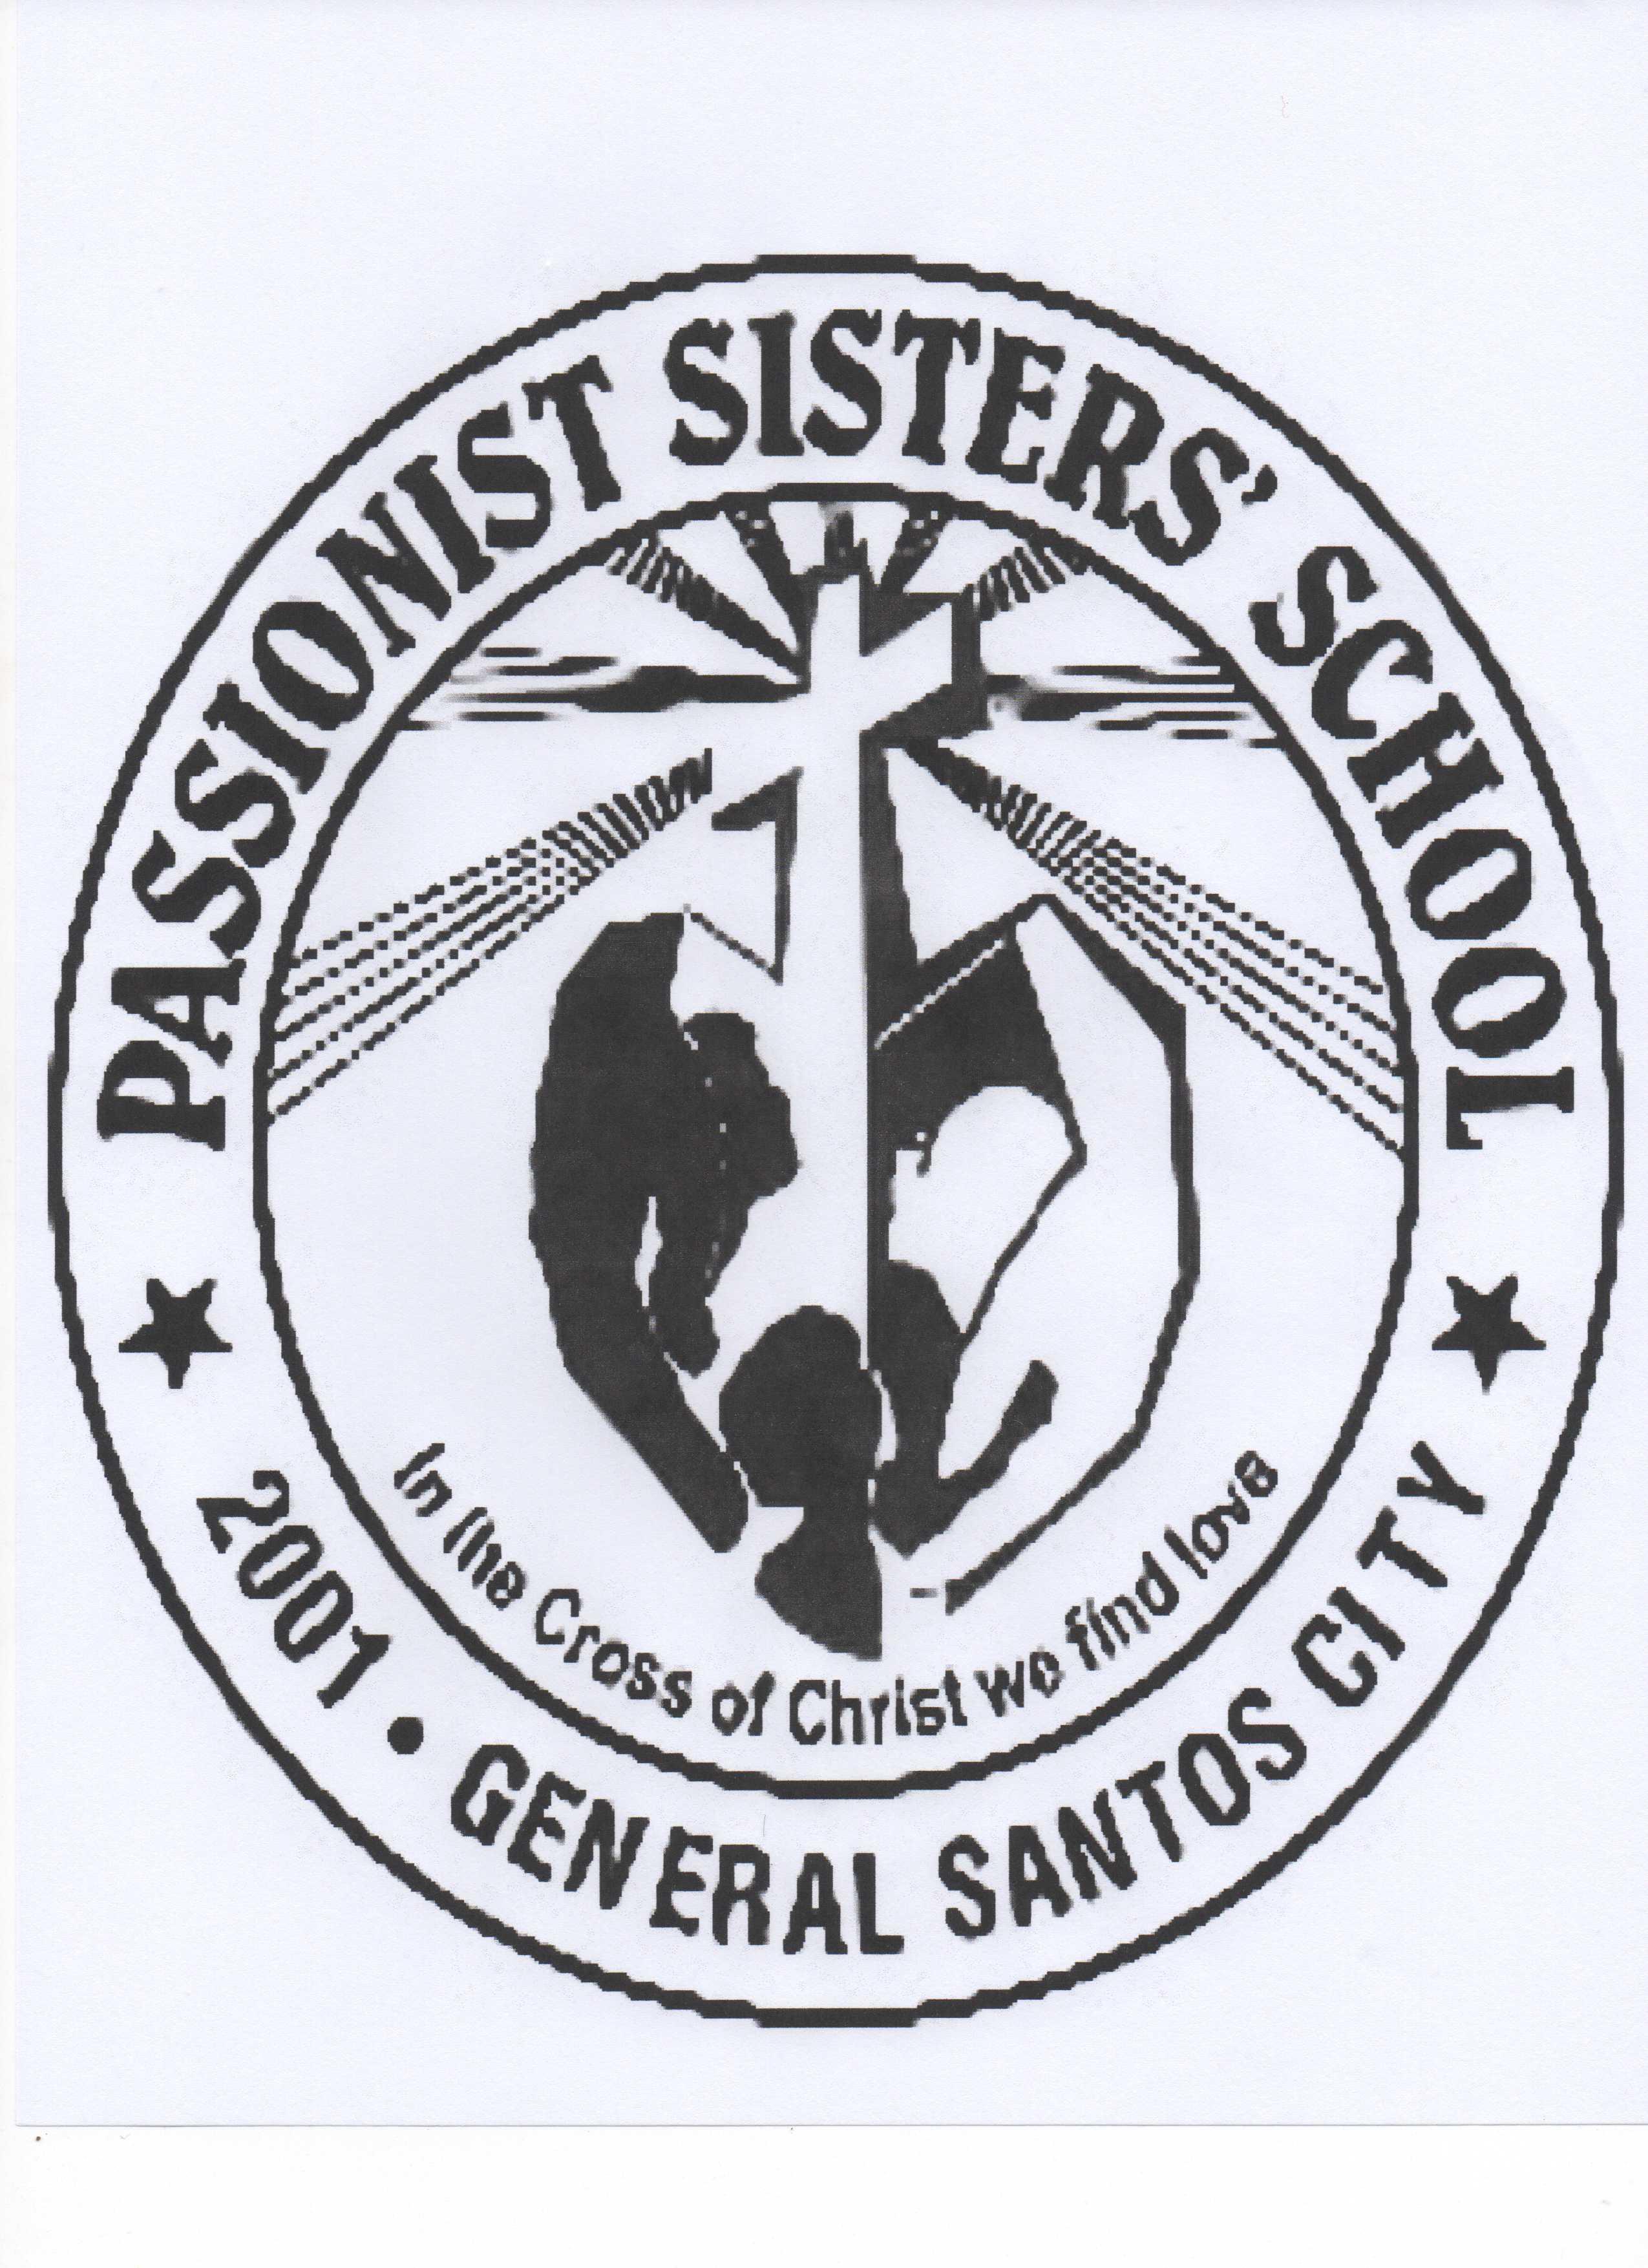 Passionist Sisters School, Inc. (Form.Frescobaldi School) Logo